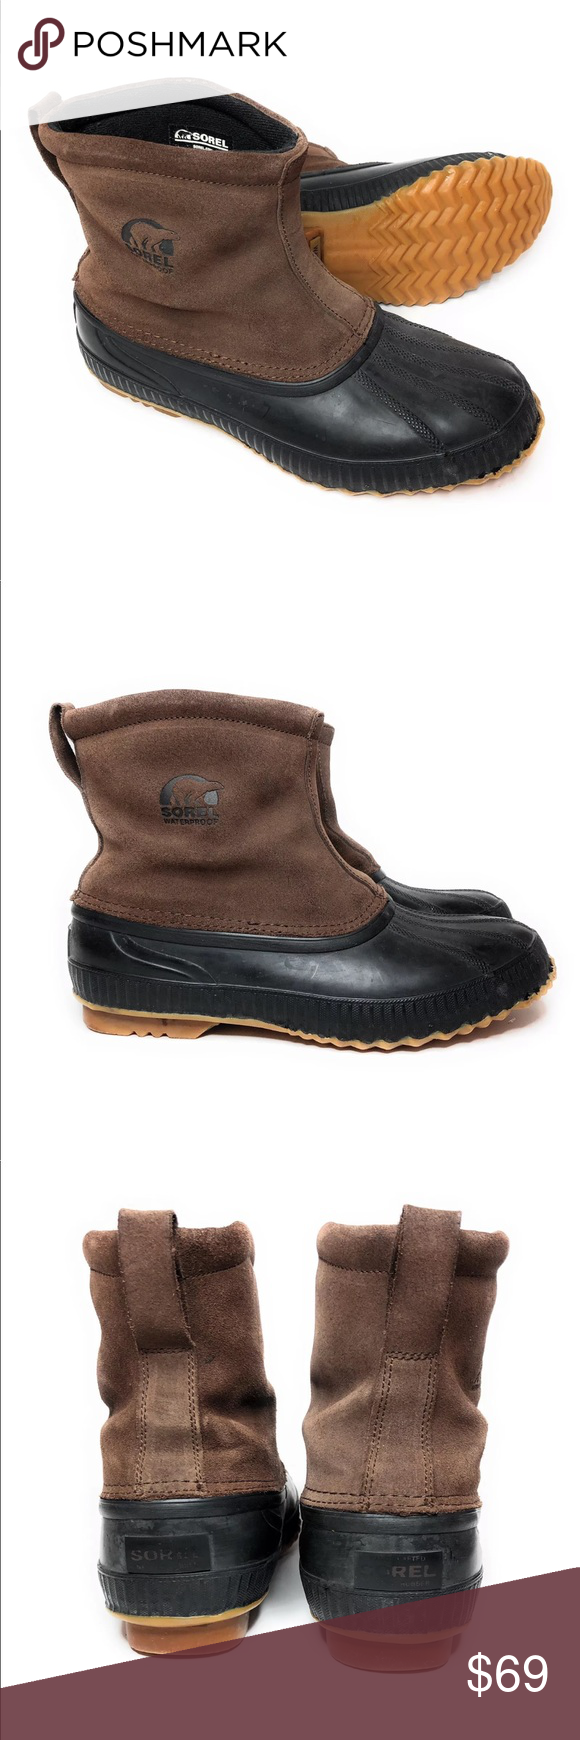 e96cee84289 SOREL Men's Boots 11 ARAPAHO Waterproof Thinsulate Sorel men's ...